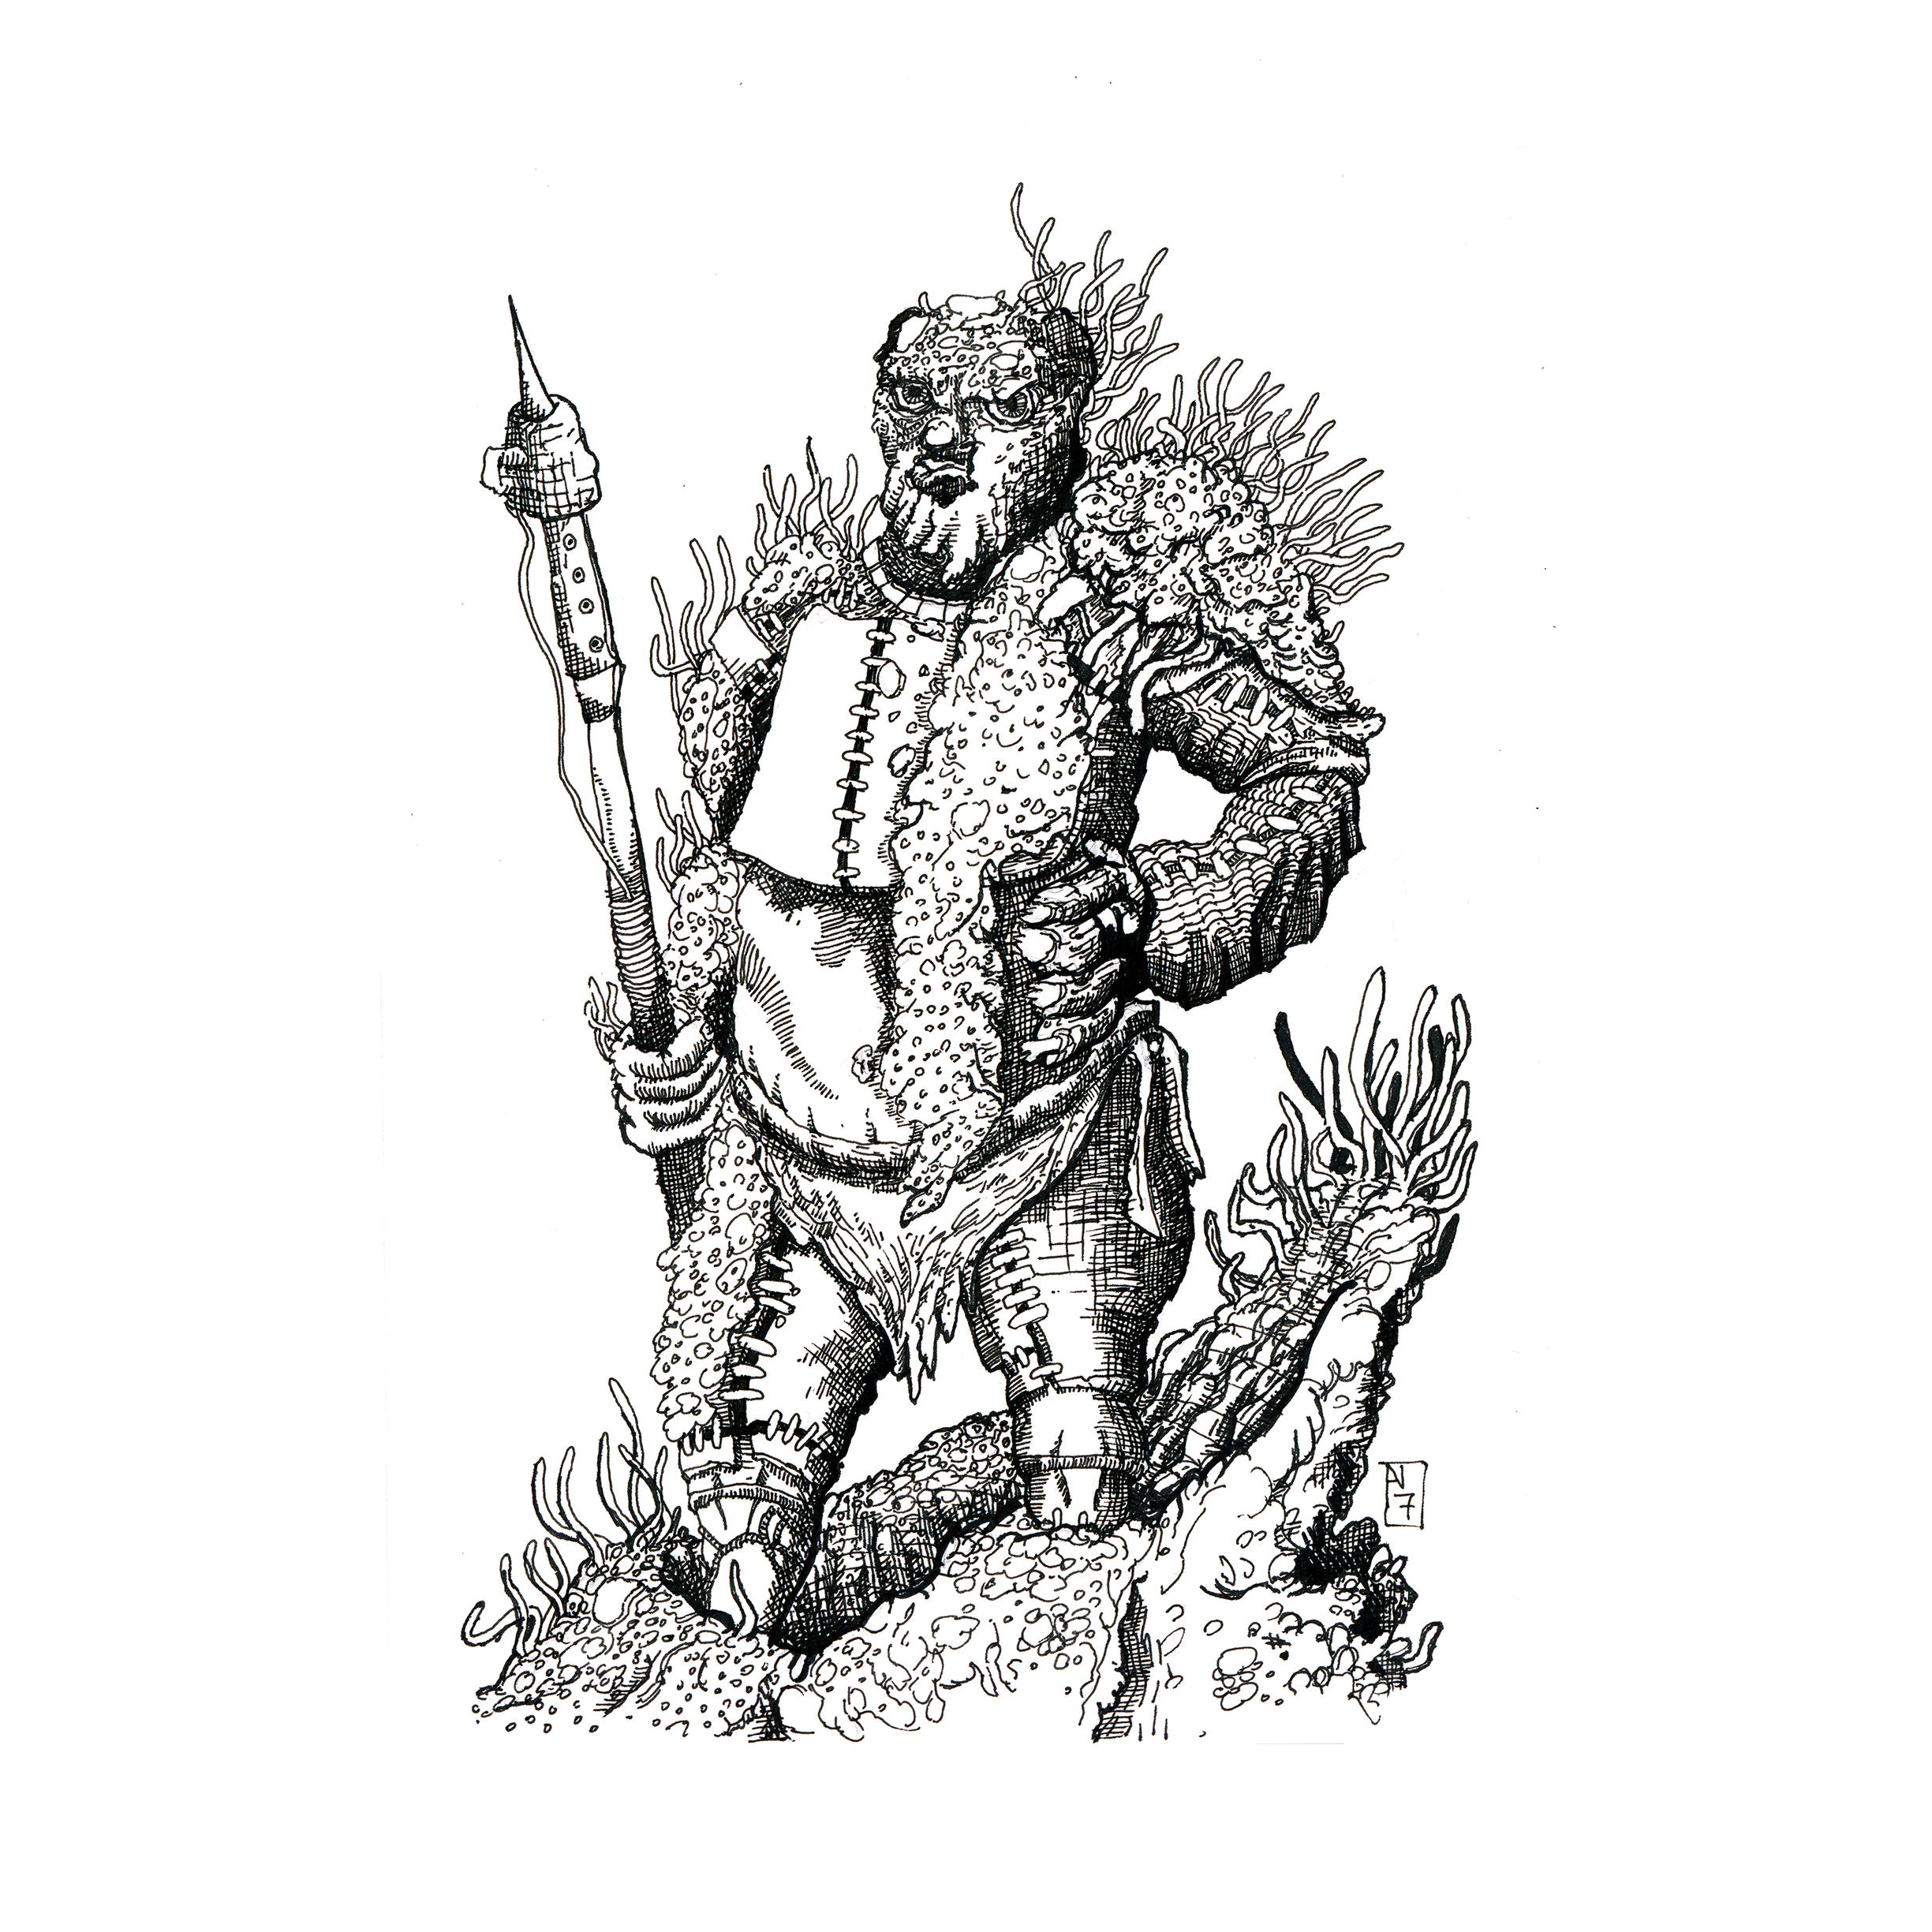 Wormbleed Fisherman (Patreon illustration) by oag-thomas